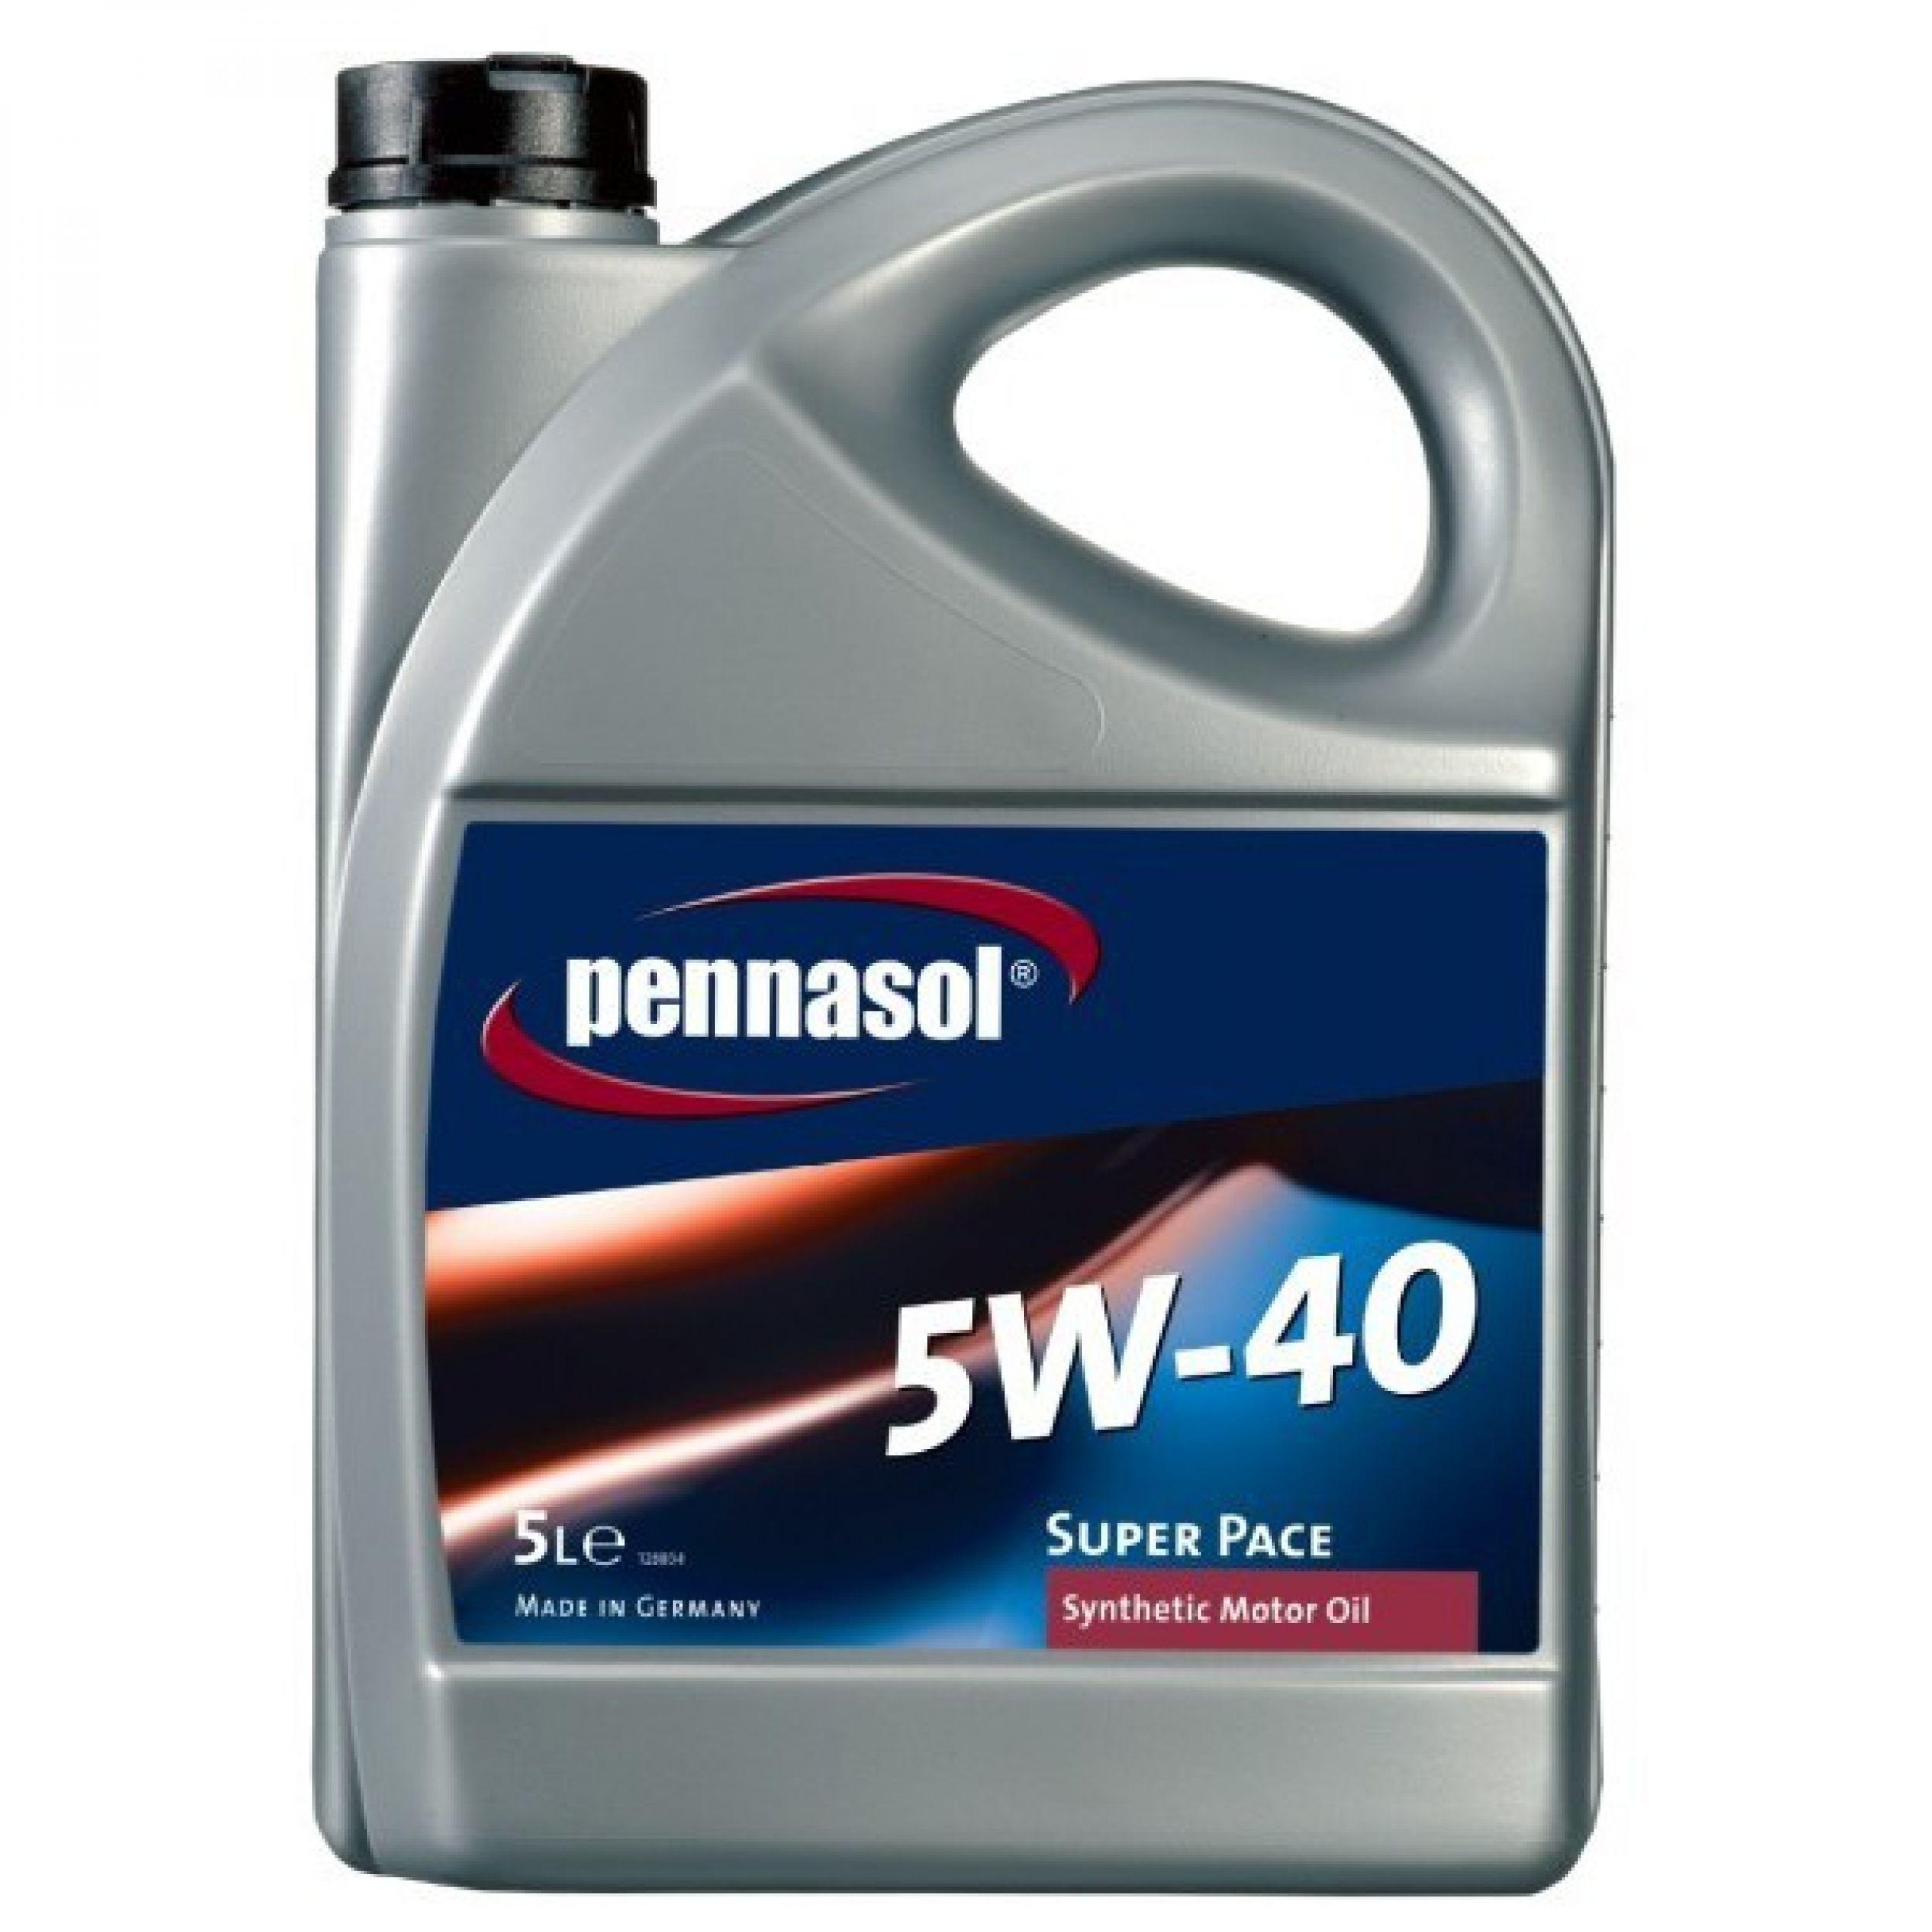 pennasol-super-pace-5w40.jpg